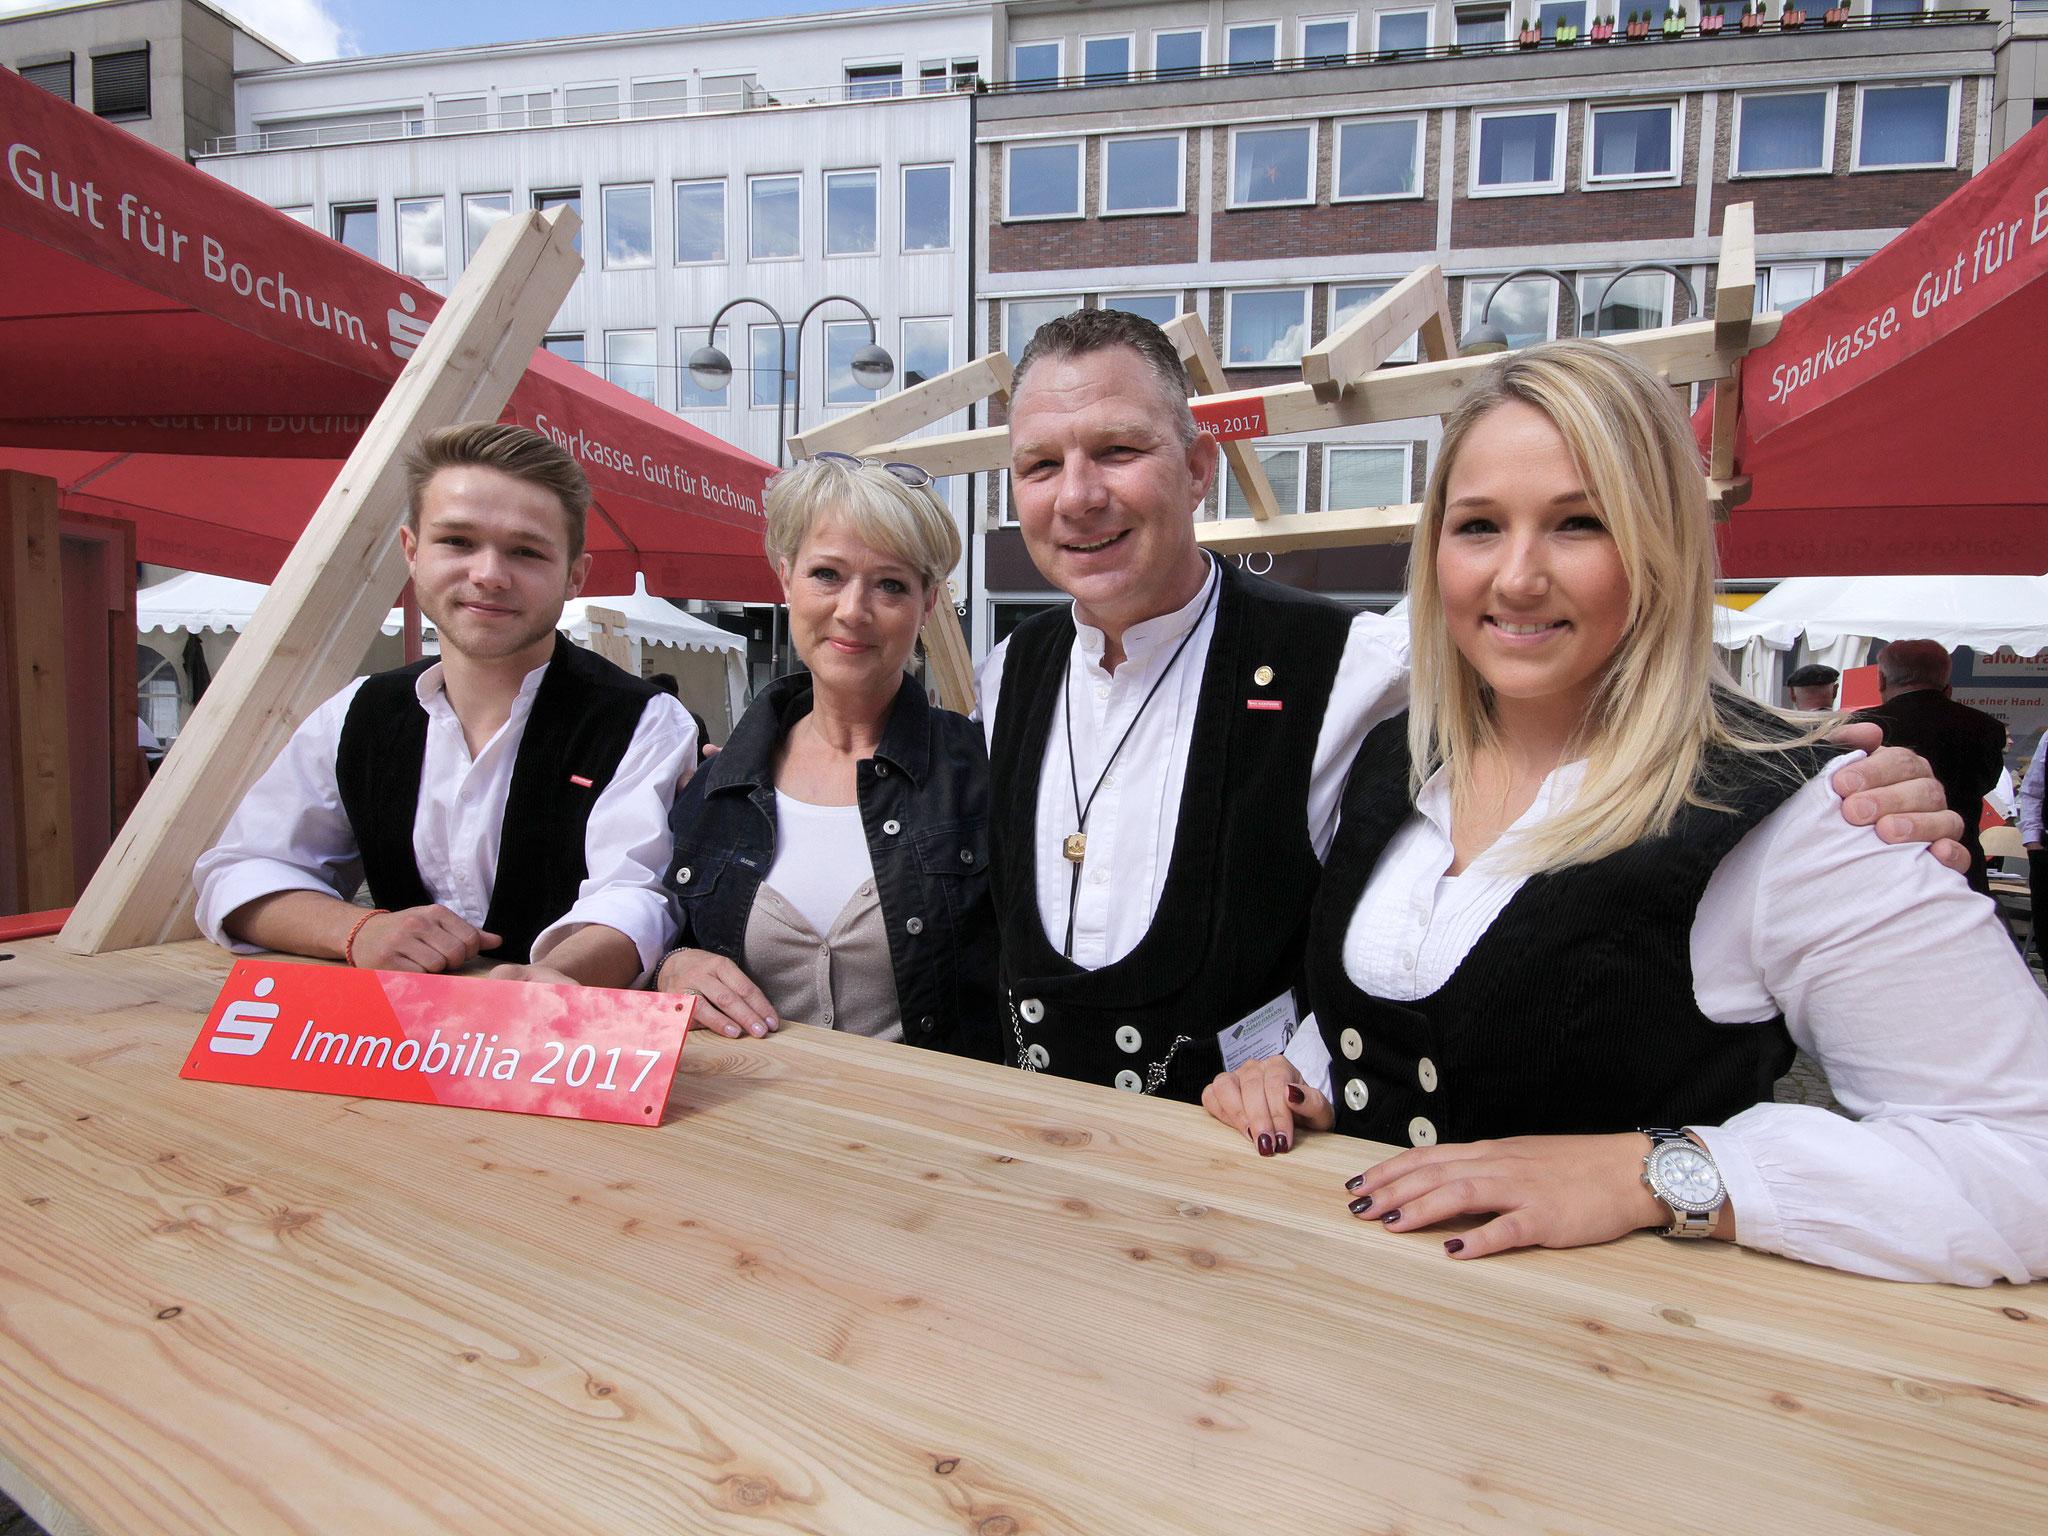 Louis, Claudia, Stefan & Carolin Zimmermann bei der Sparkassen Immobilia 2017